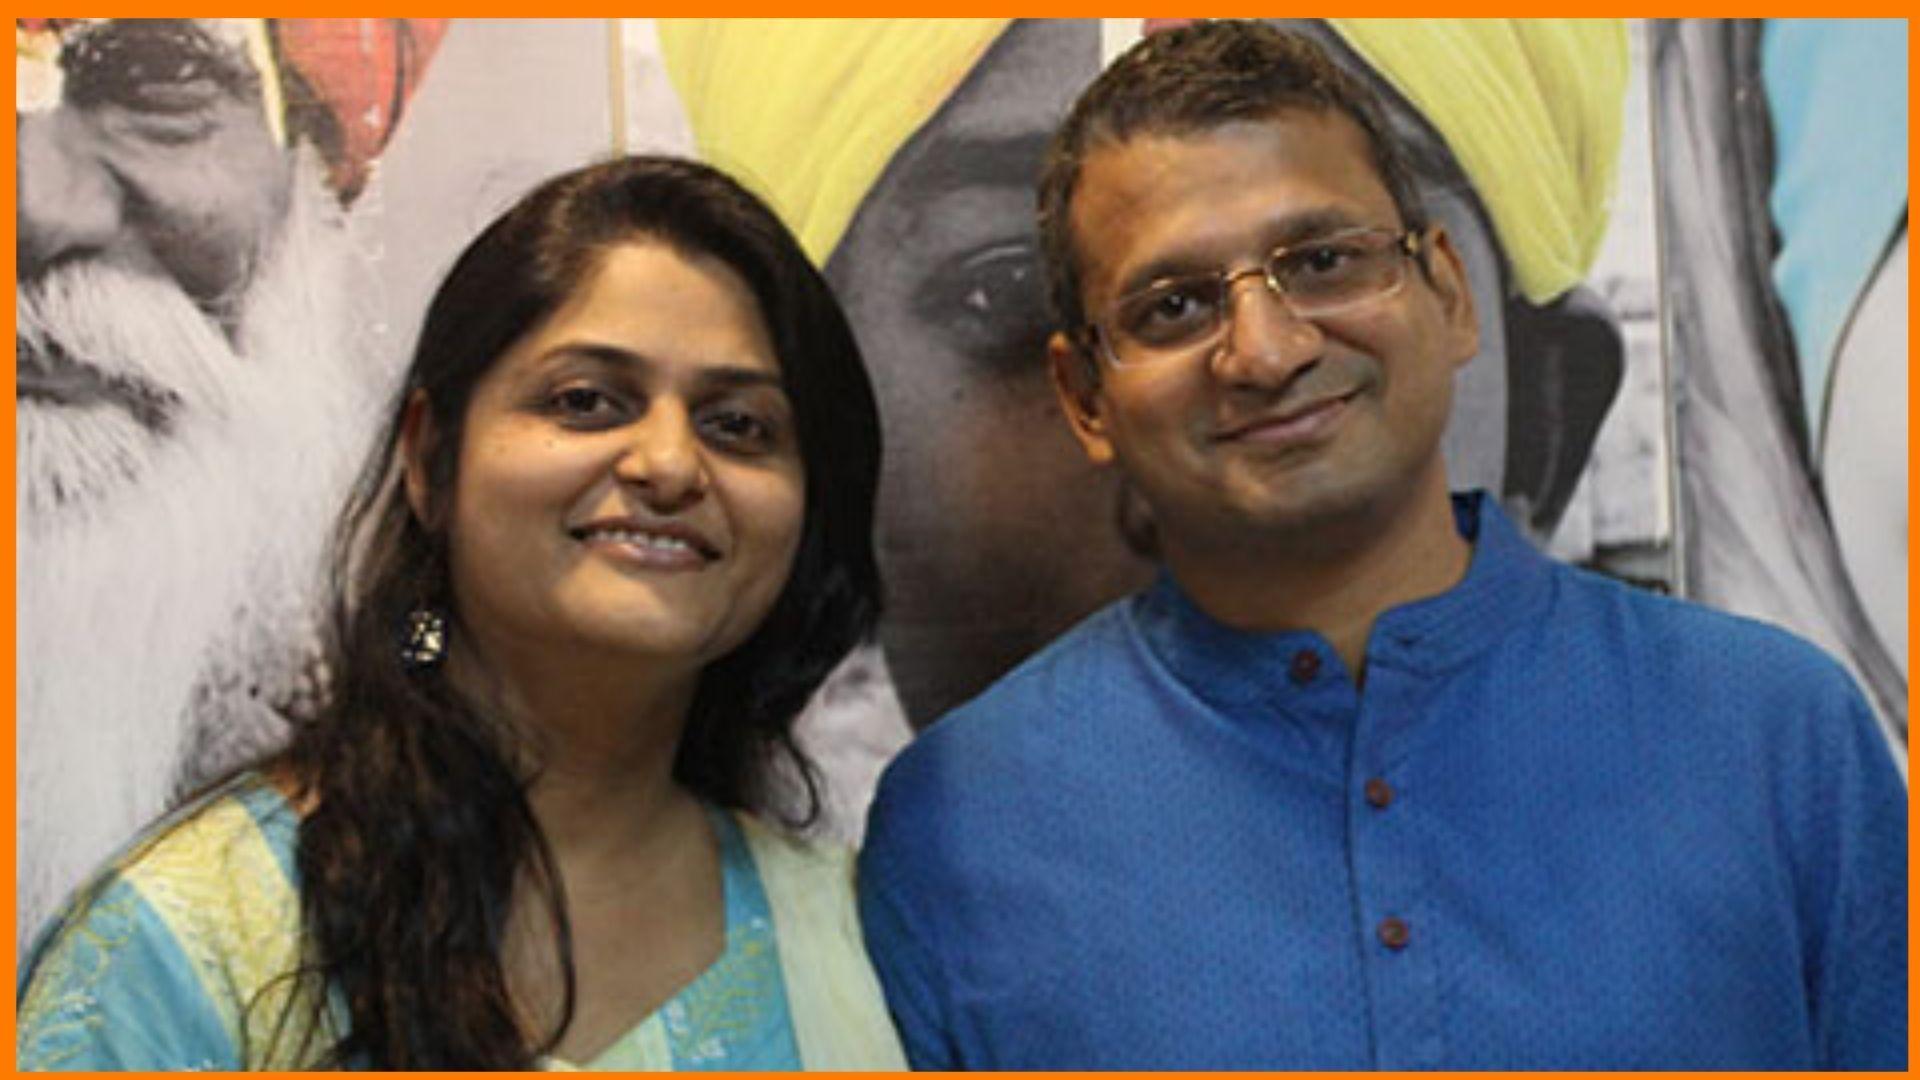 Monica Gupta and Manoj Gupta are founders of Craftsvilla